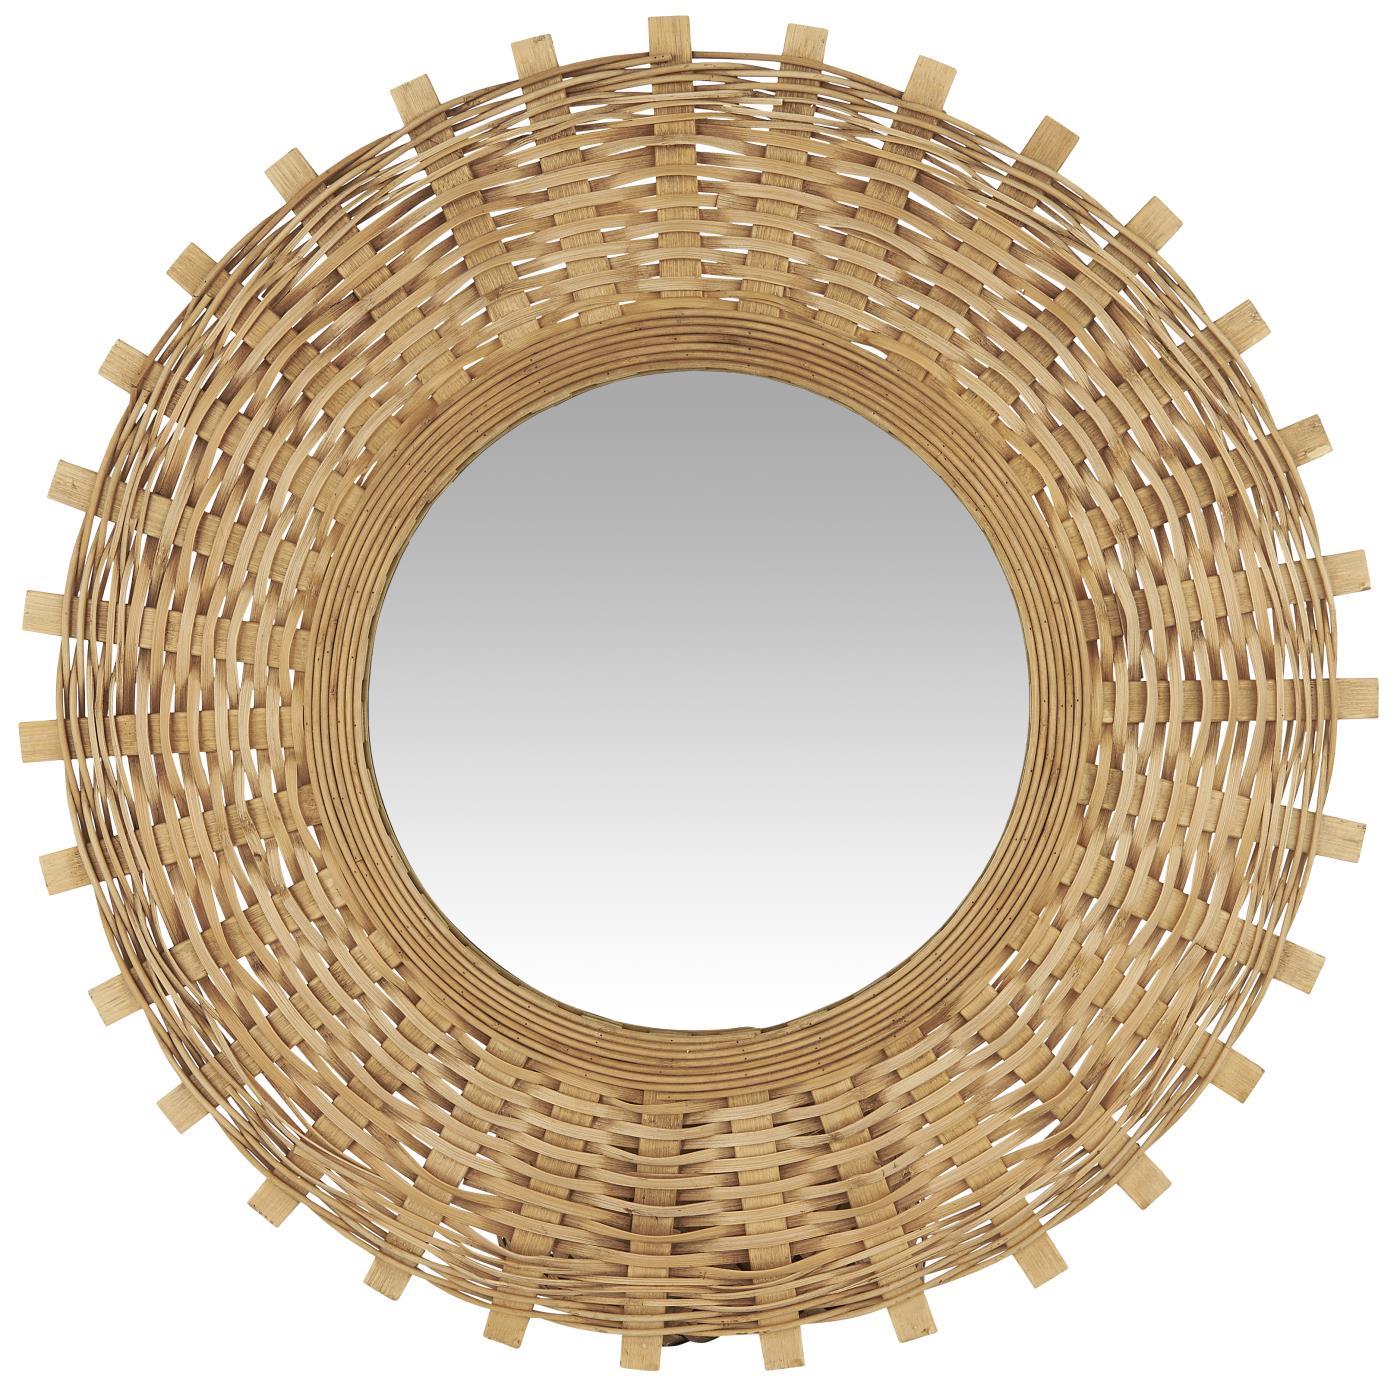 Seinäpeili Bambupunos, Ib Laursen